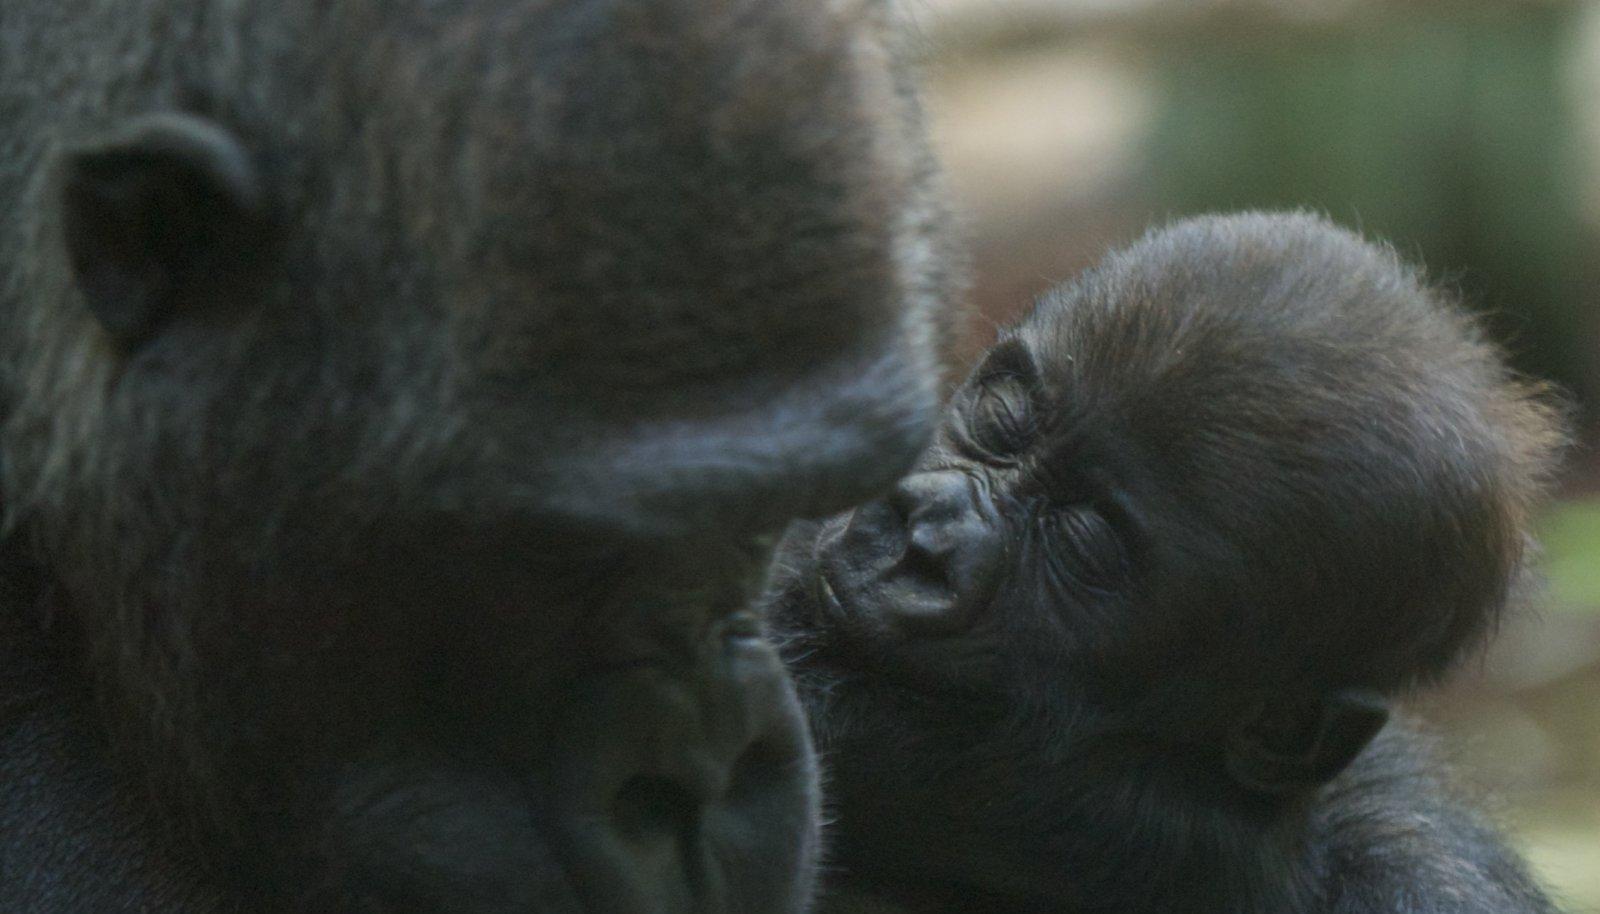 Gorillad loomaaias